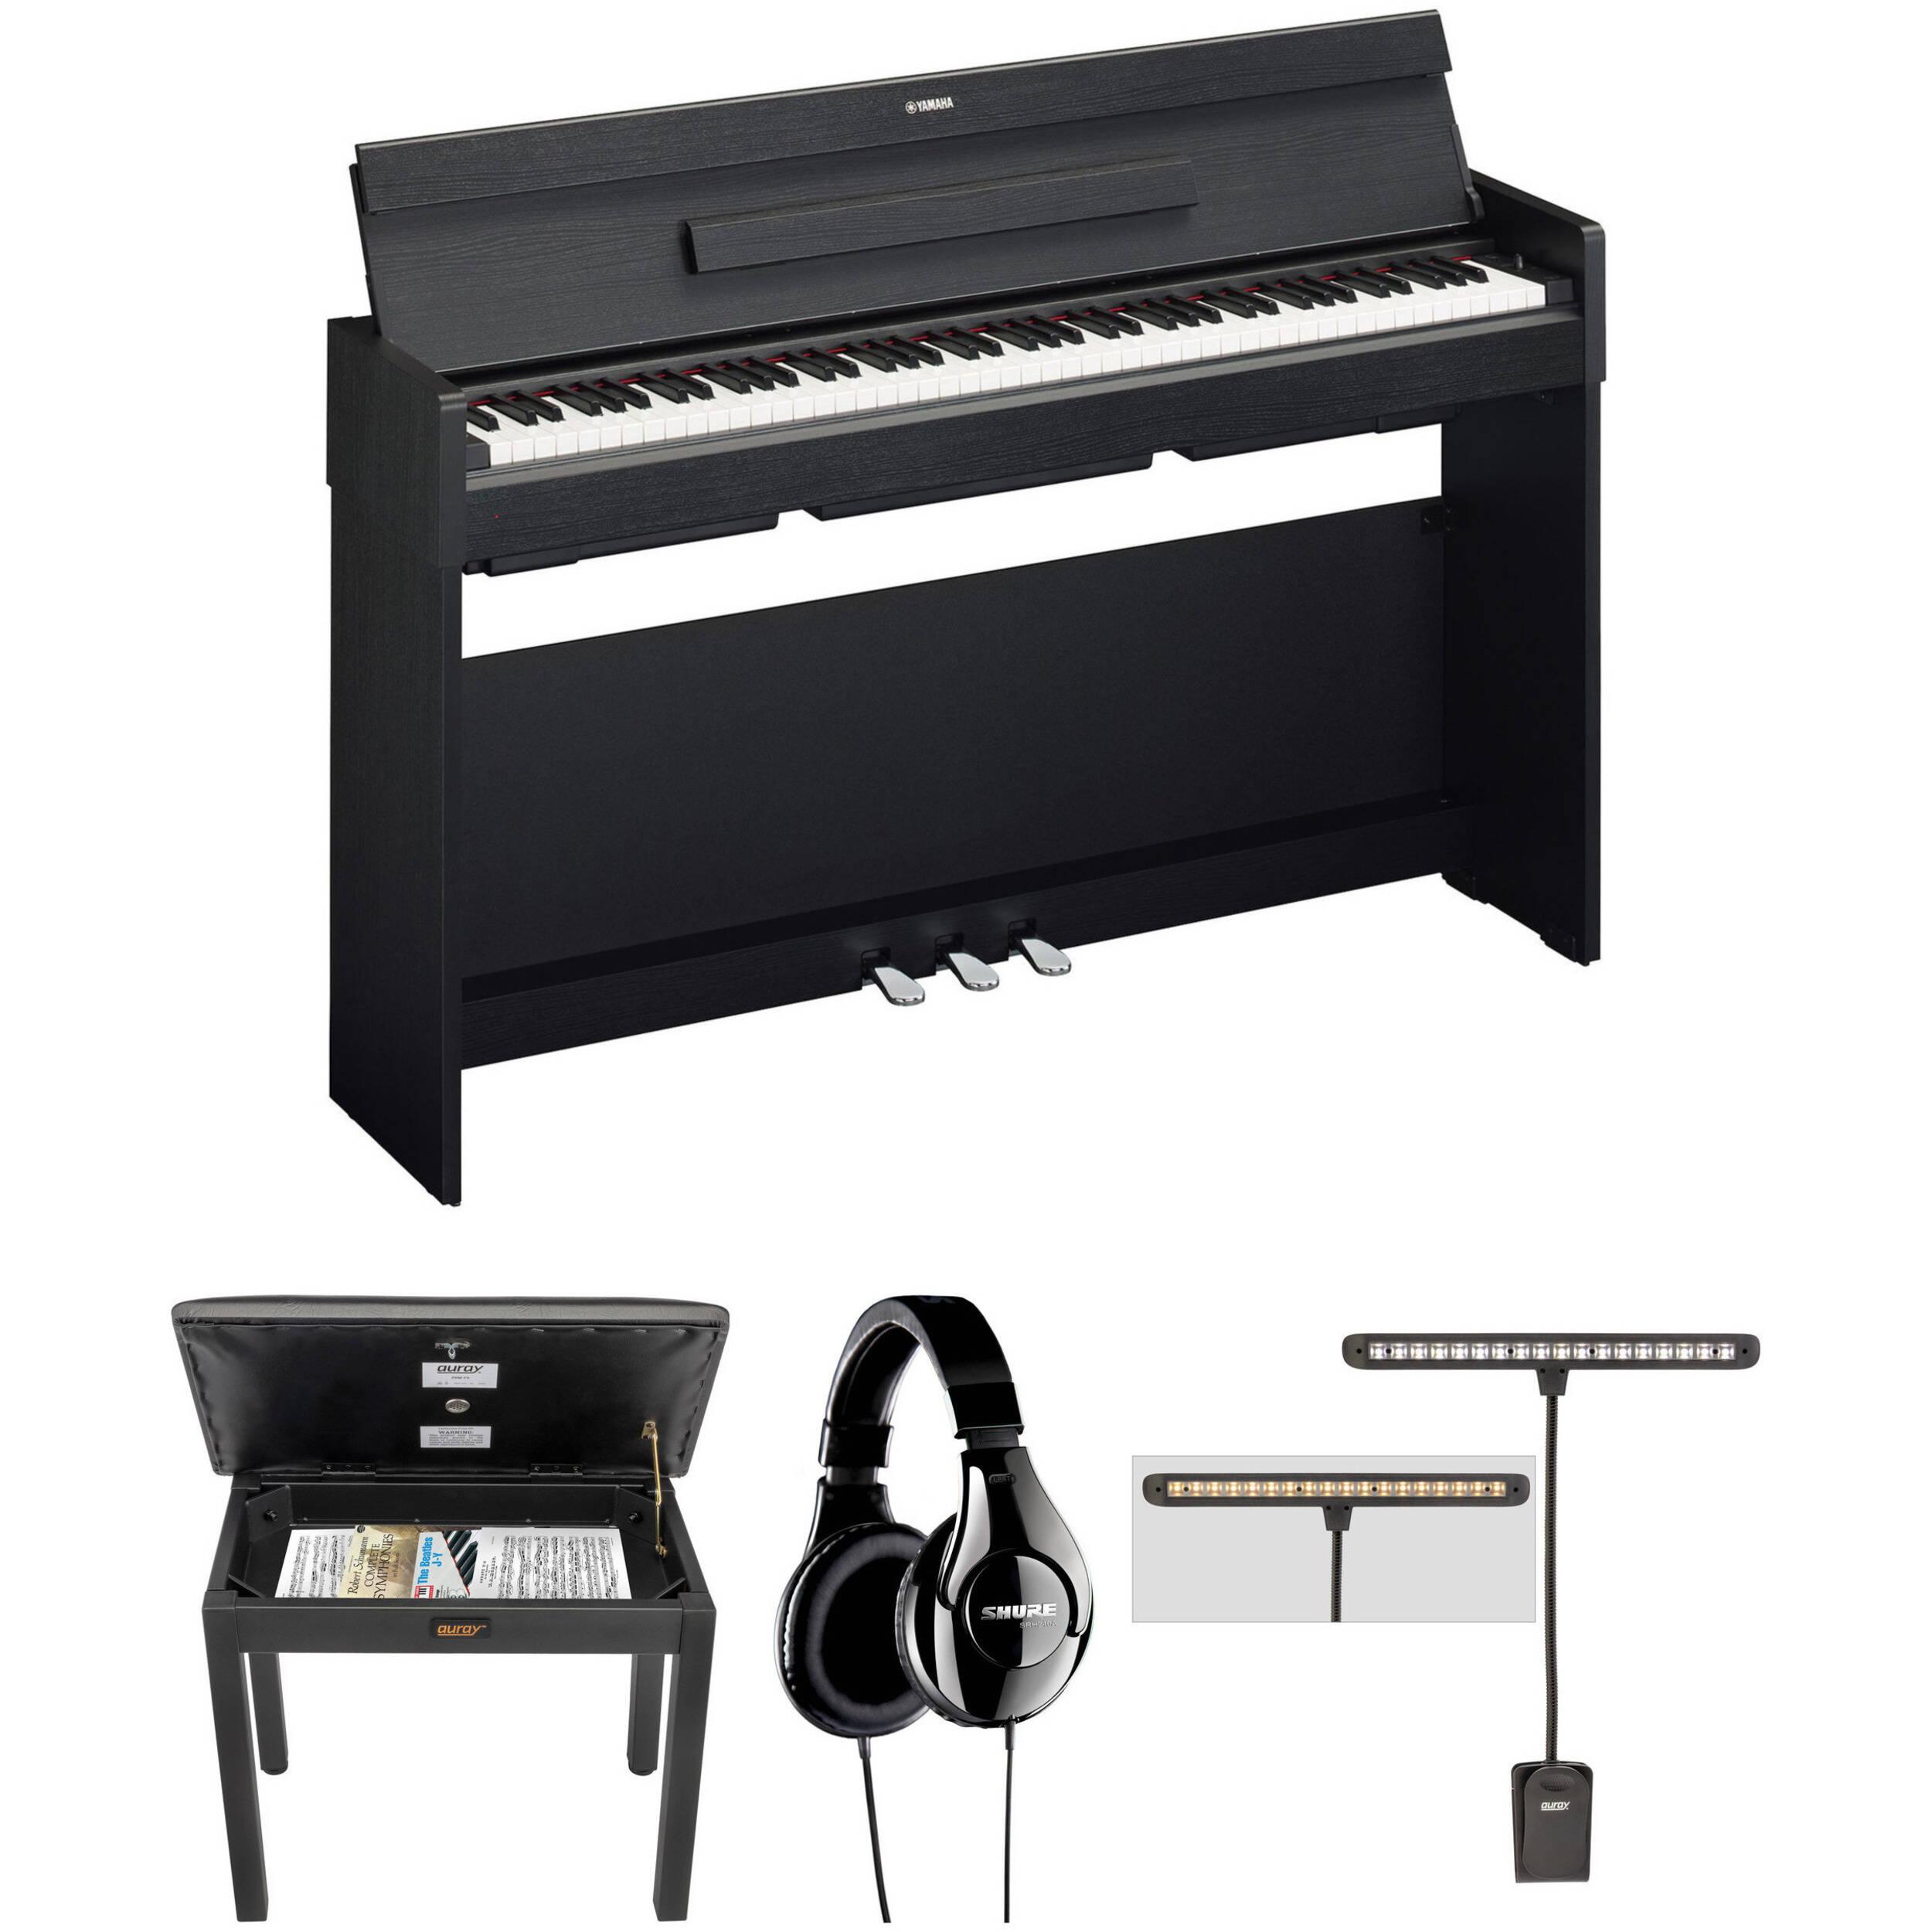 yamaha arius ydp s34 digital piano kit with bench headphones. Black Bedroom Furniture Sets. Home Design Ideas